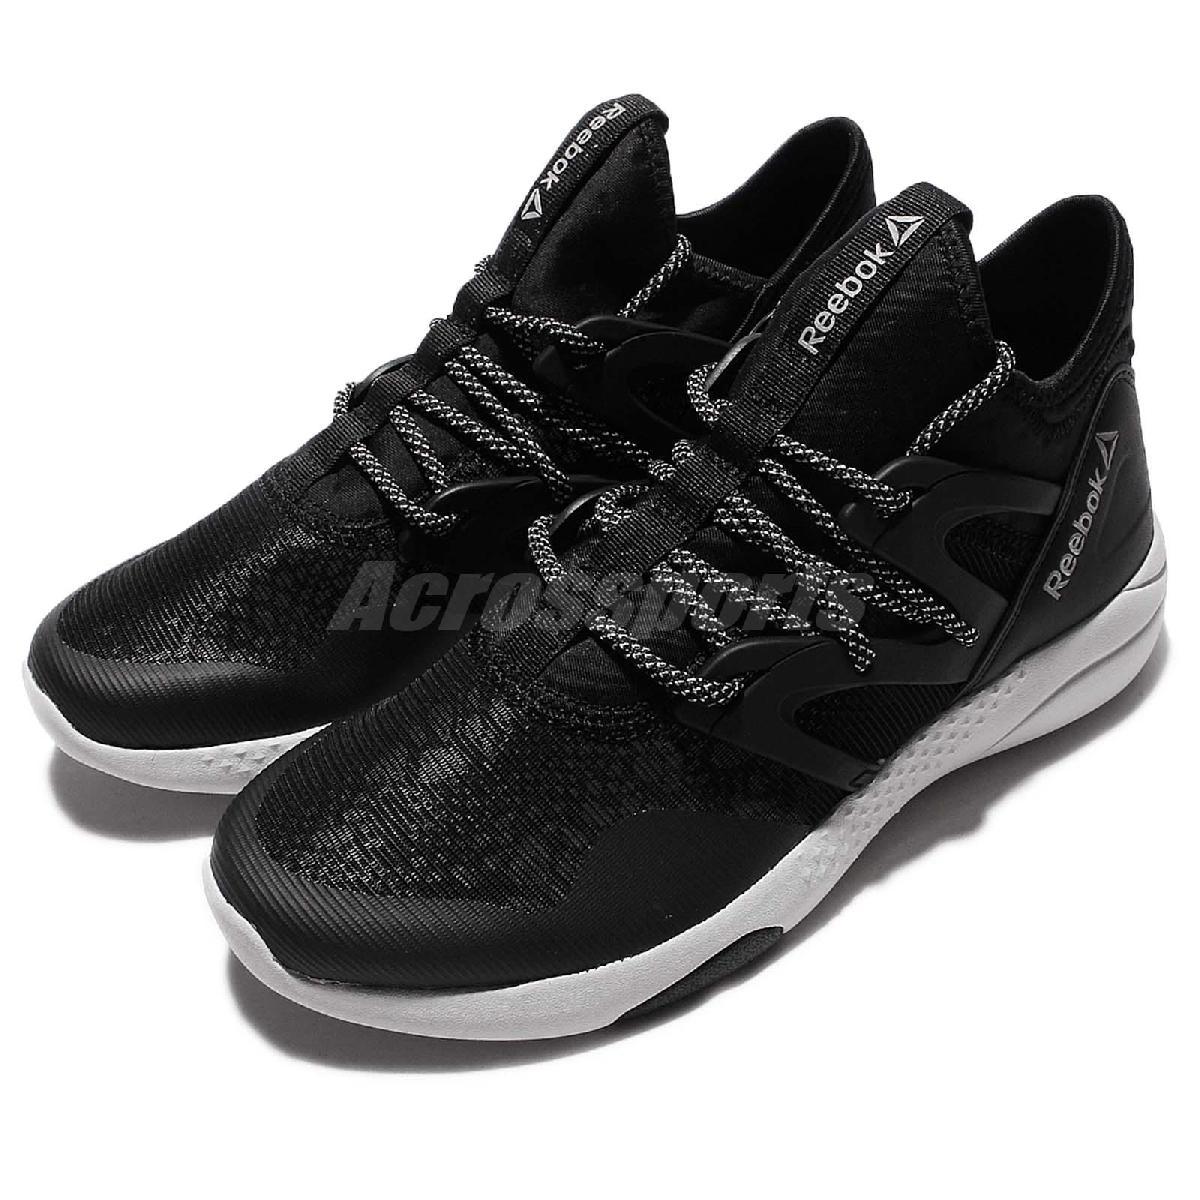 Reebok休閒鞋Hayasu黑白白底跳舞鞋運動鞋反光女鞋PUMP306 AQ9883